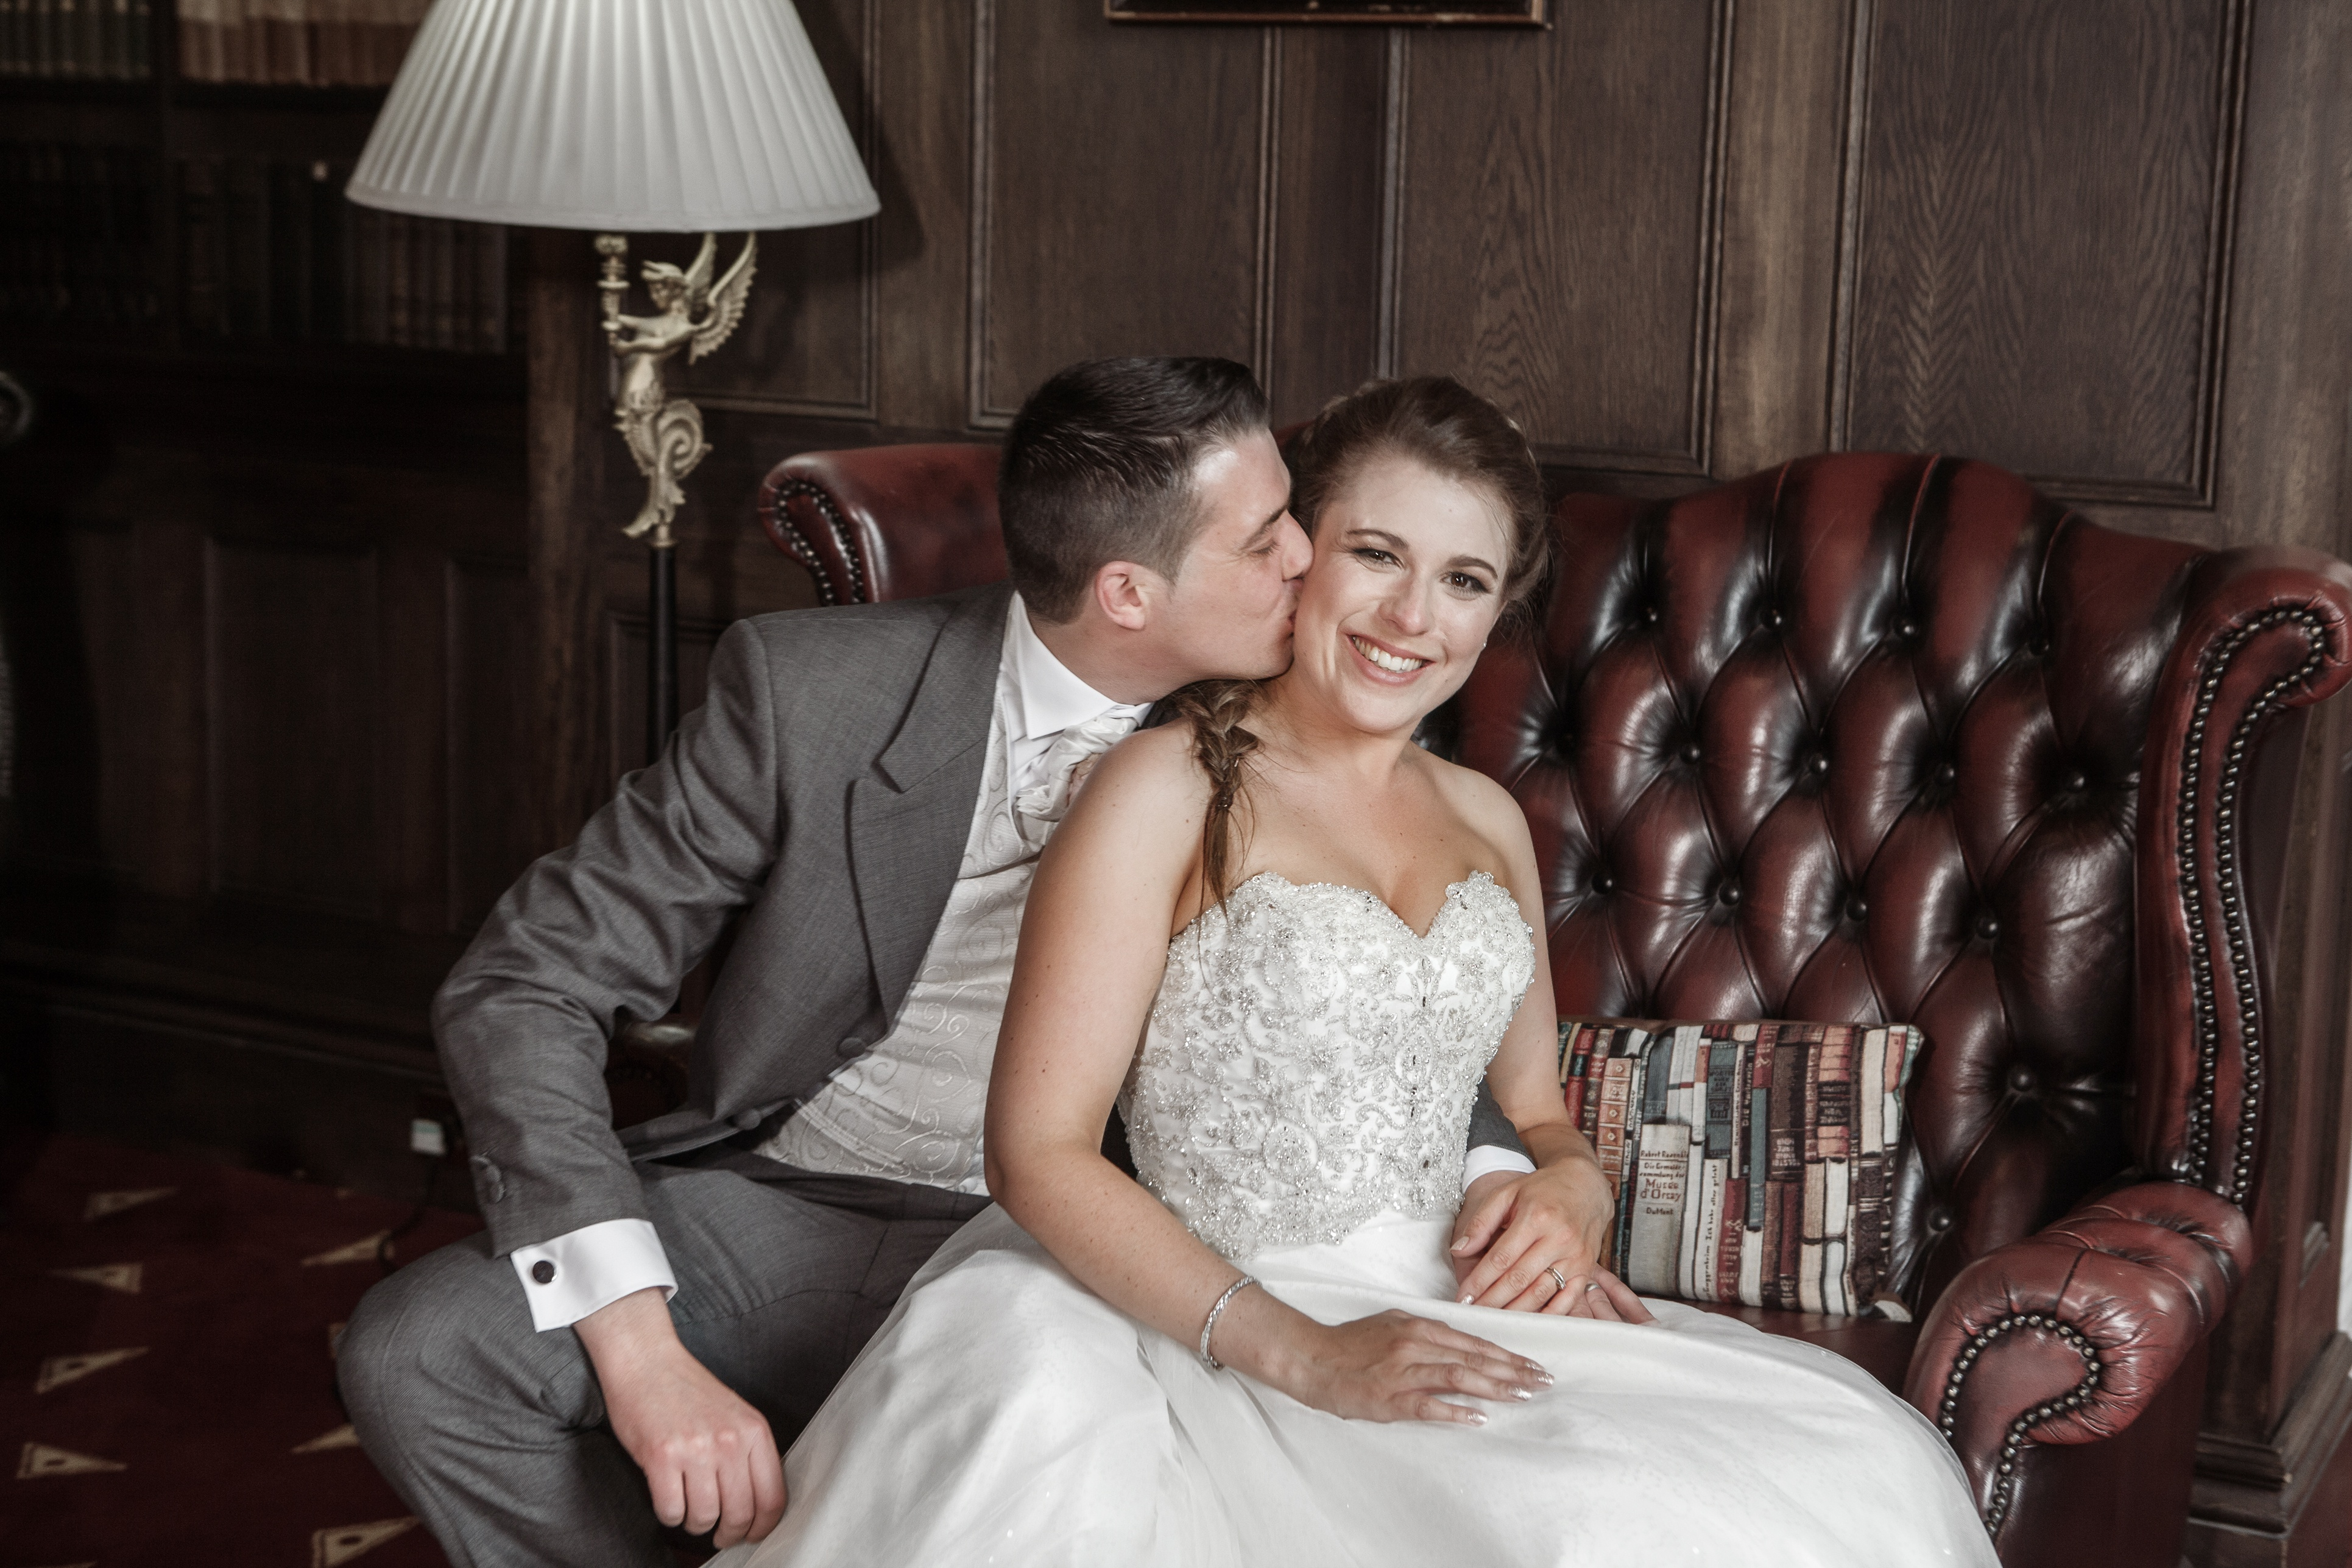 Shattle-Hall-wedding-photographer-RD-Elen-Studio-Photography-596copy1